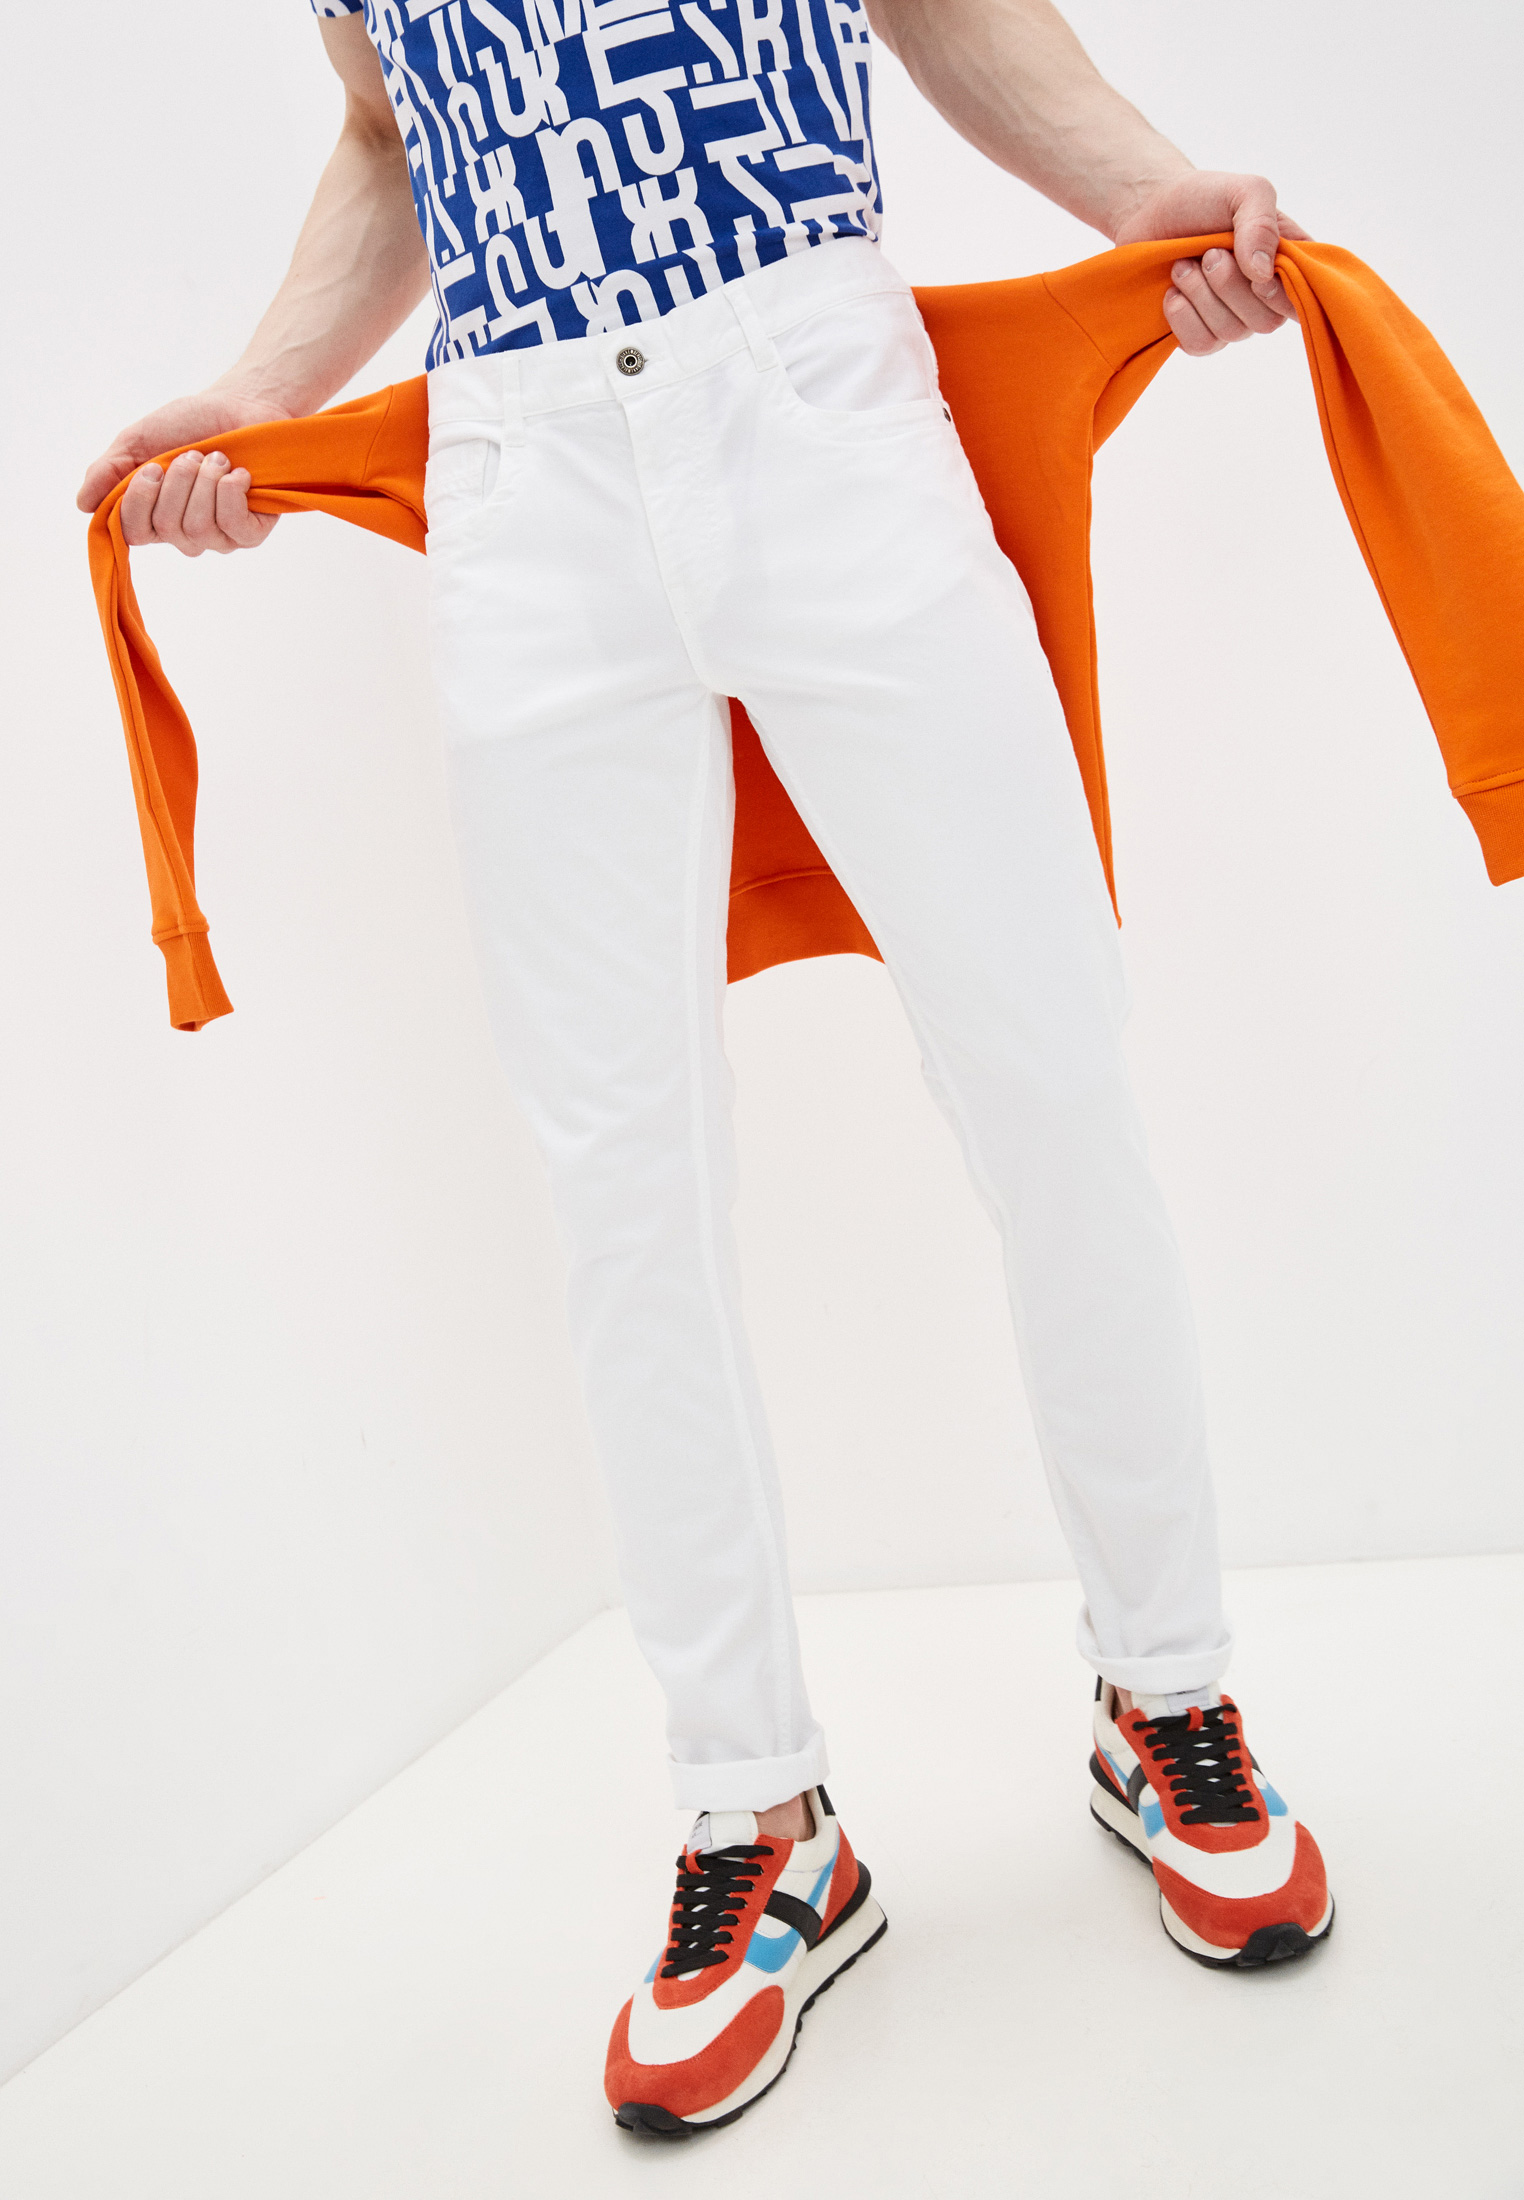 Мужские повседневные брюки Bikkembergs (Биккембергс) C Q 101 00 S 3279